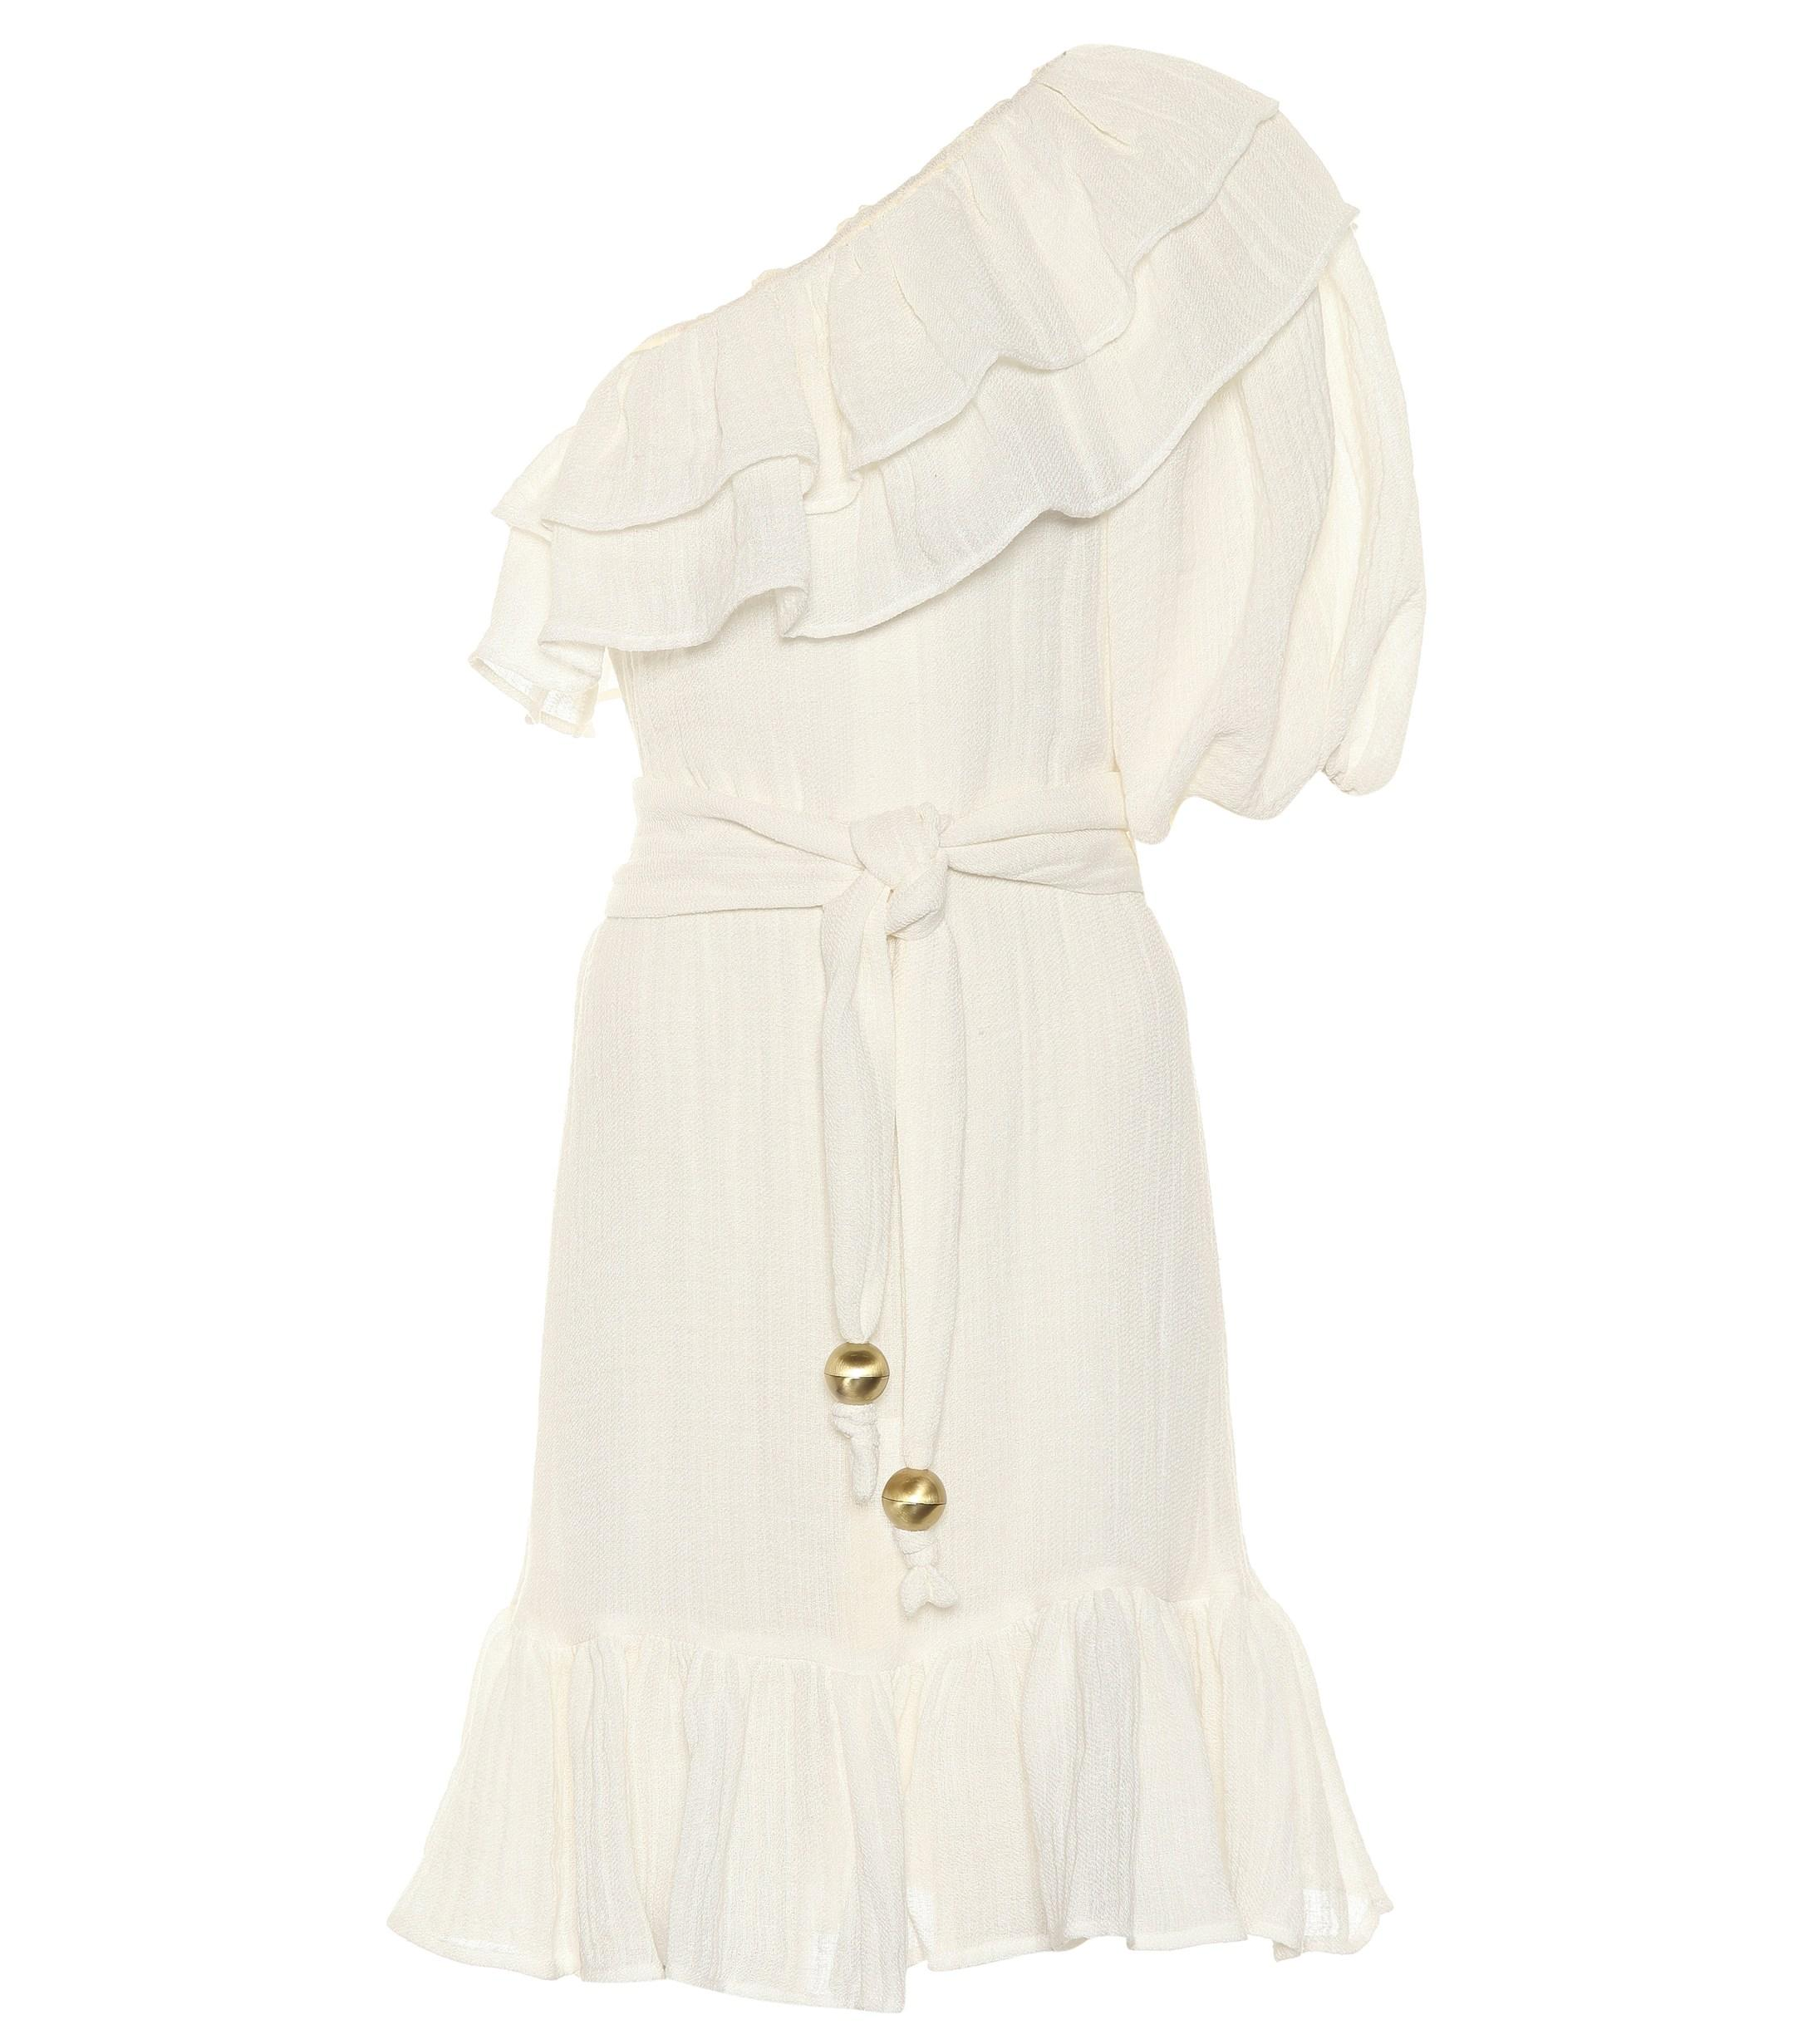 caa5c659b7 Lisa Marie Fernandez Arden Linen-blend Gauze Minidress in White - Lyst